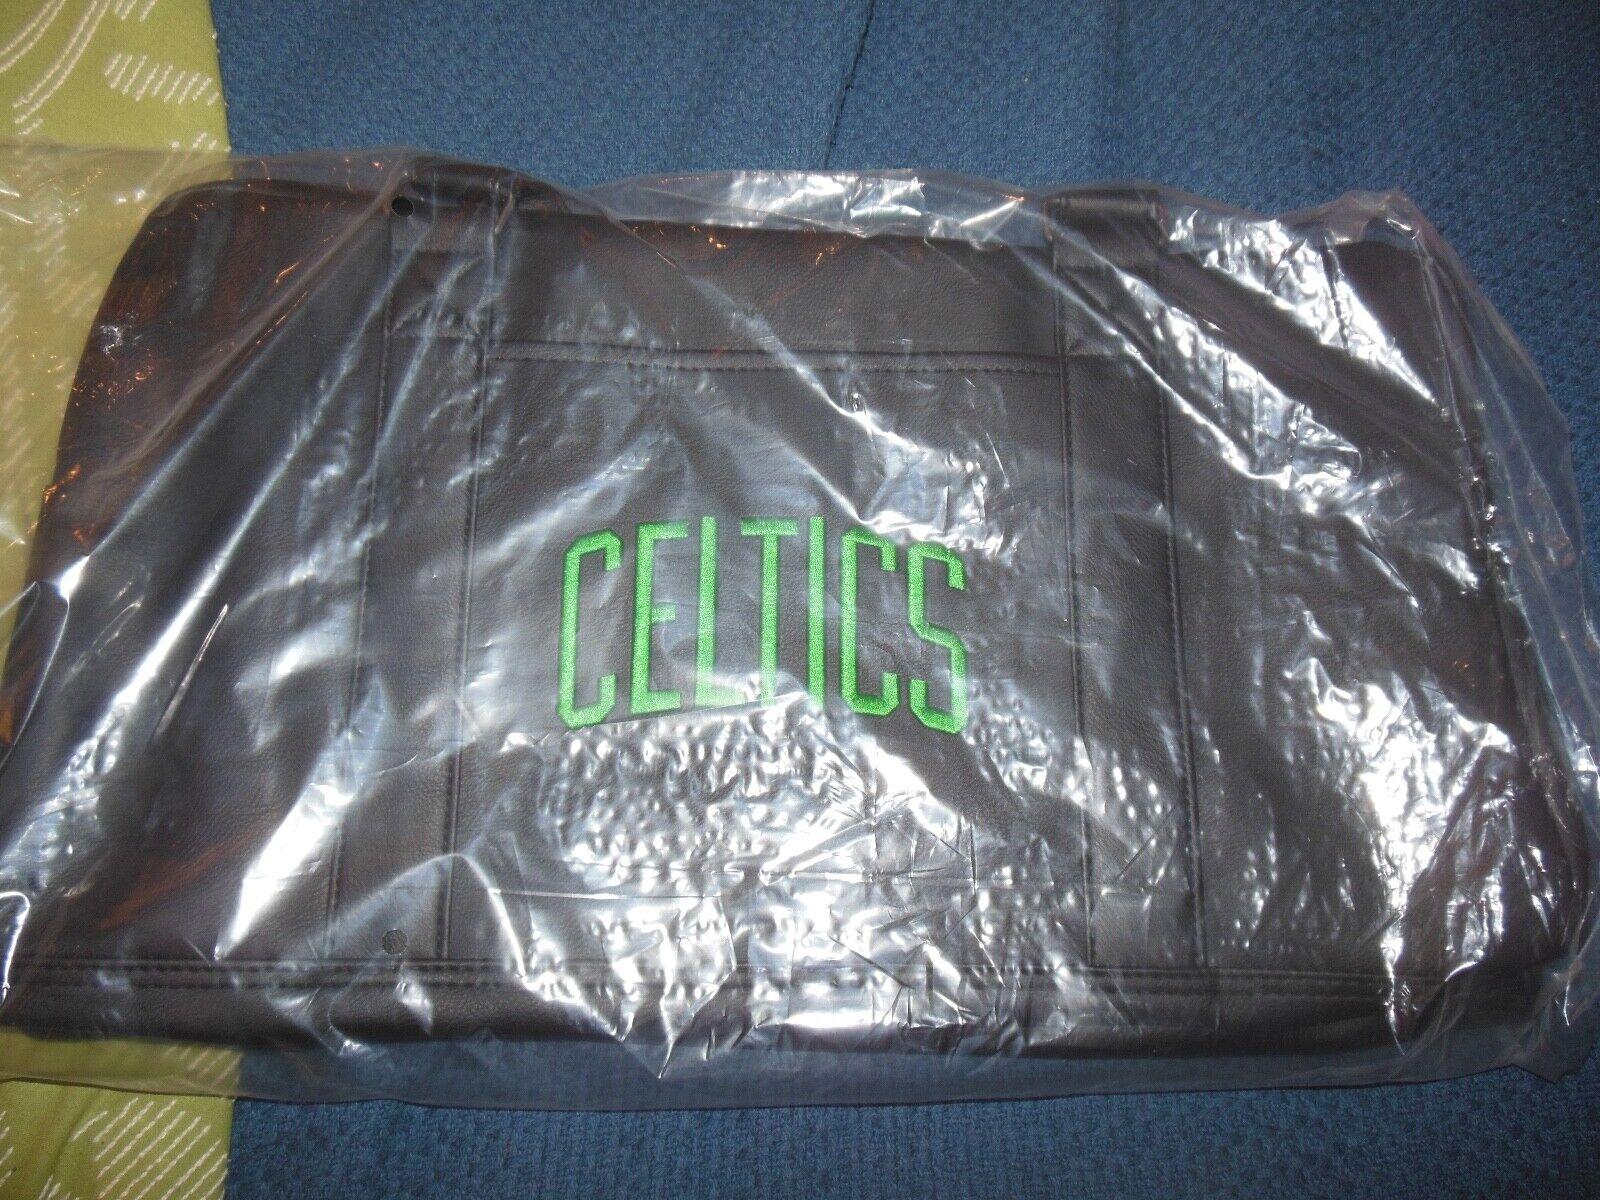 Boston Celtics Official Duffel Gym Bag Faux Leather NEW!!